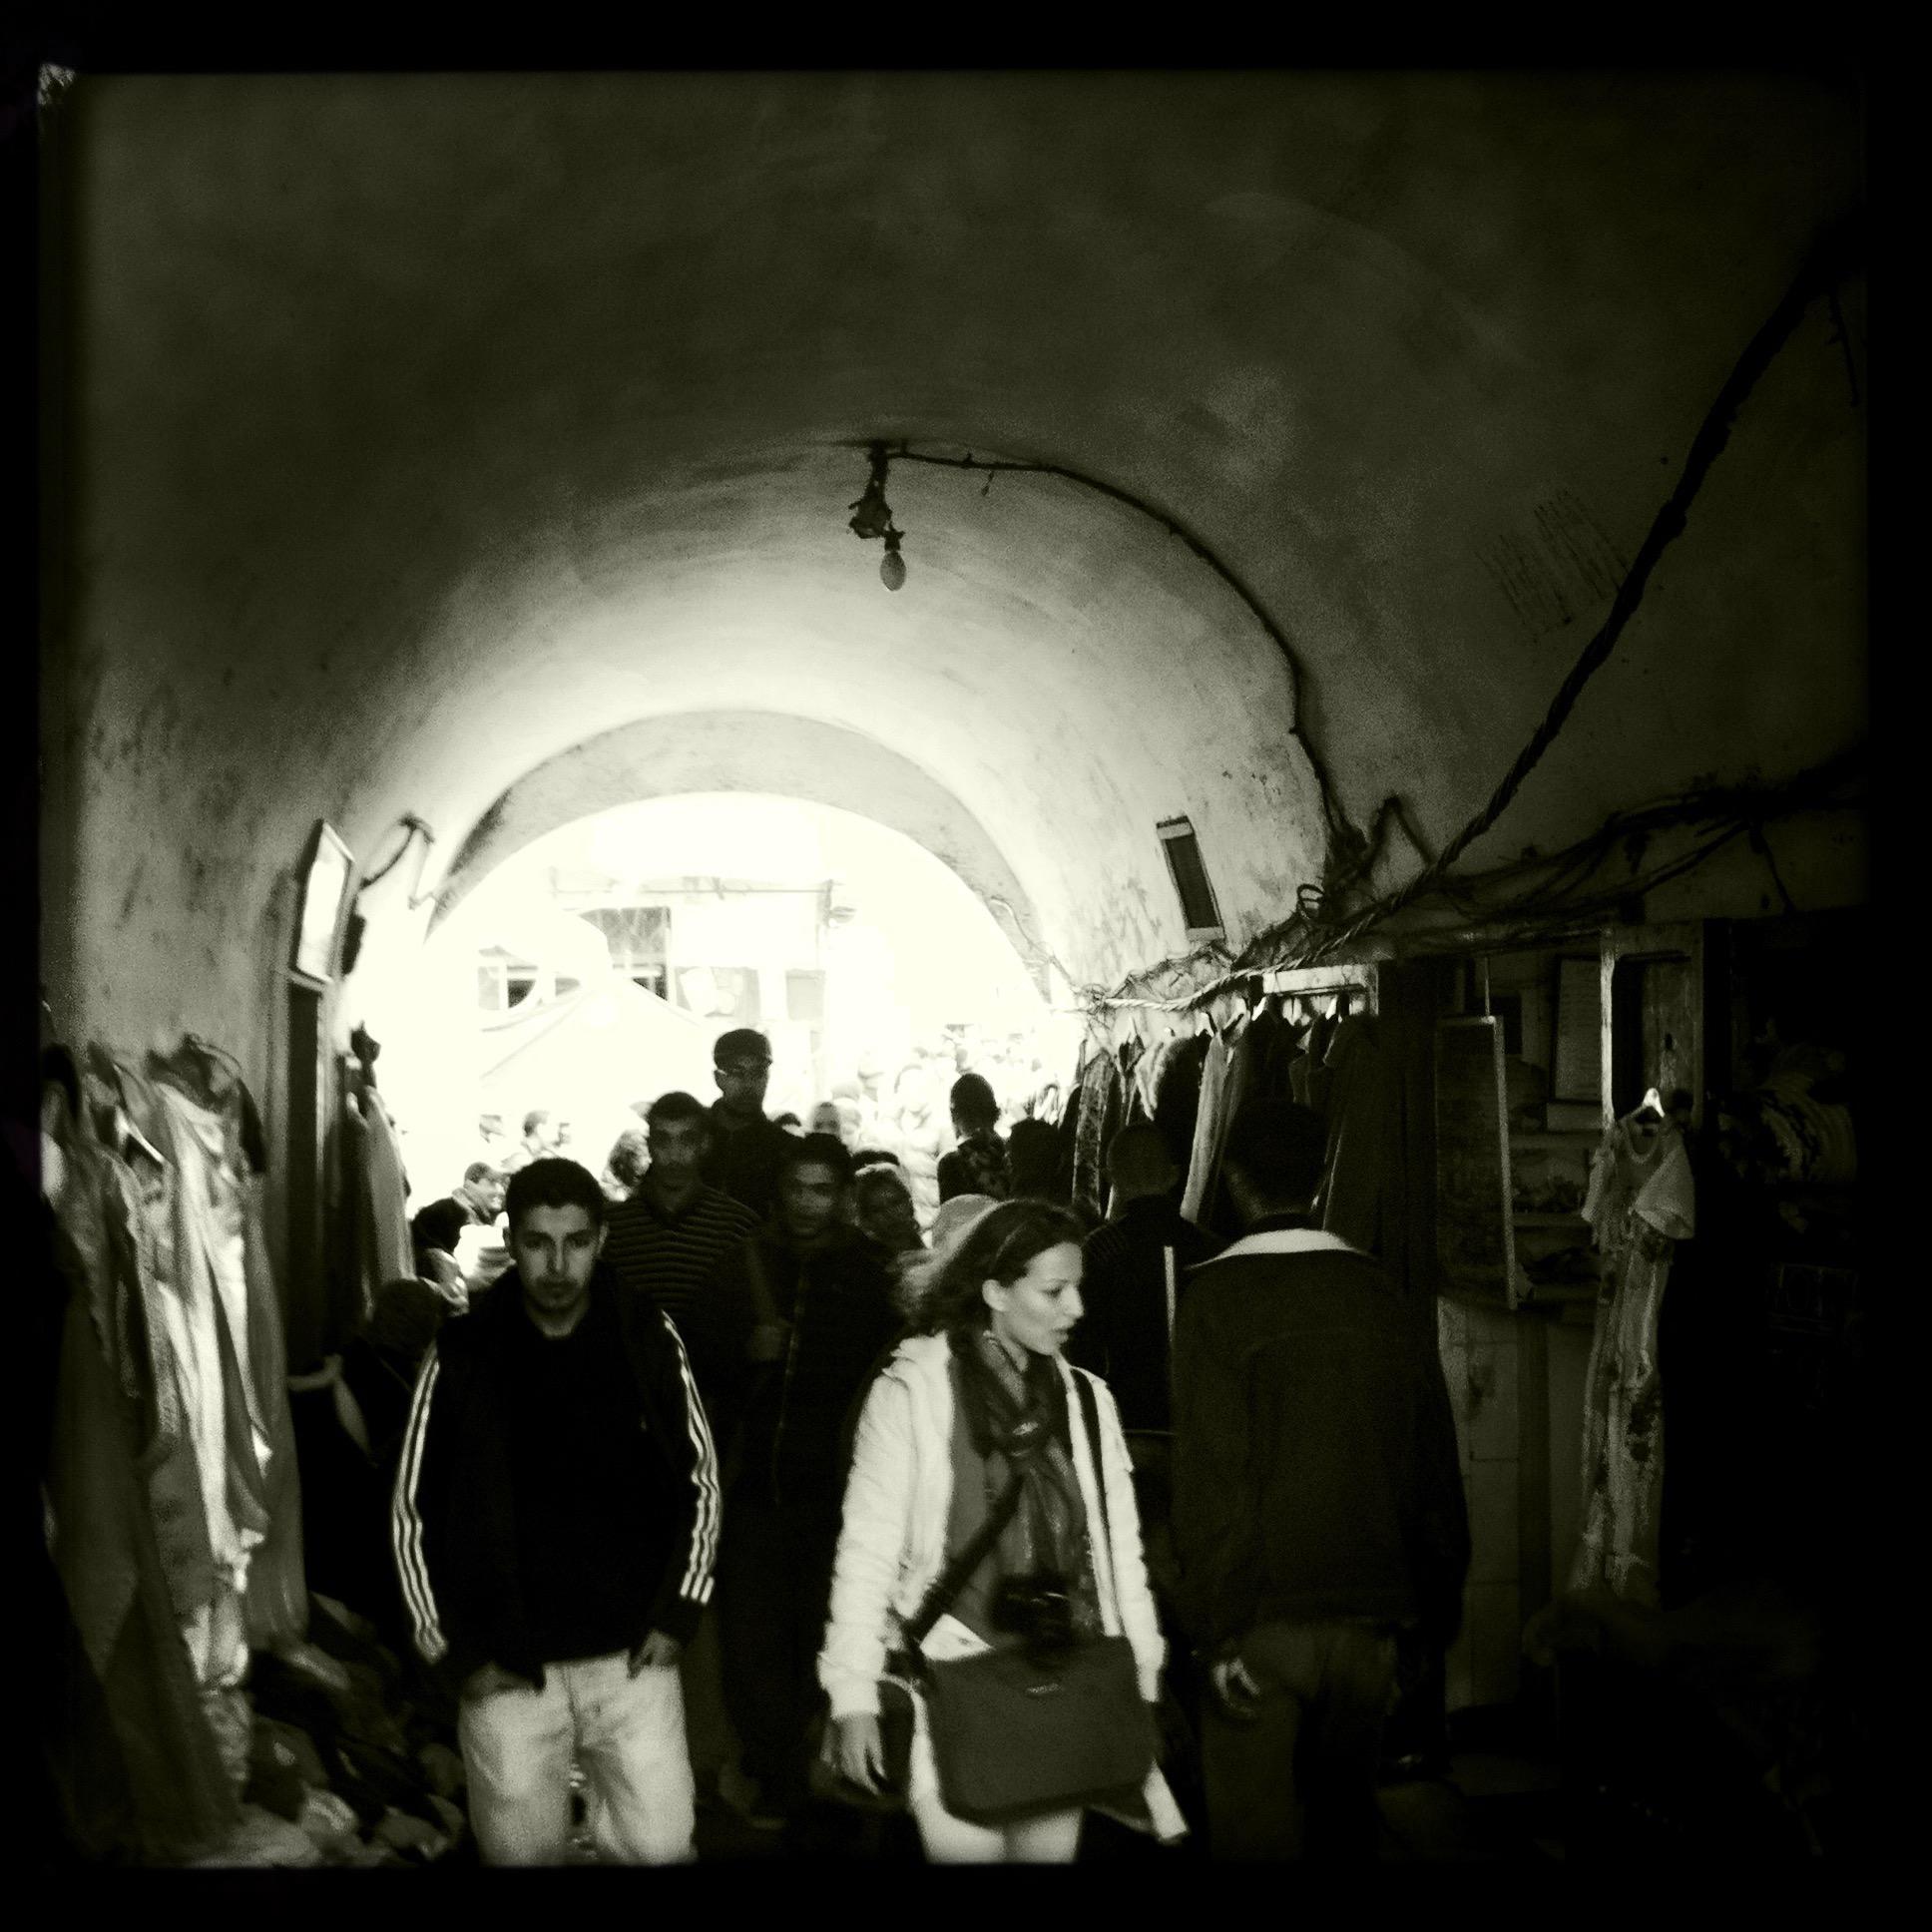 art and architecture students, medina of Tetouan